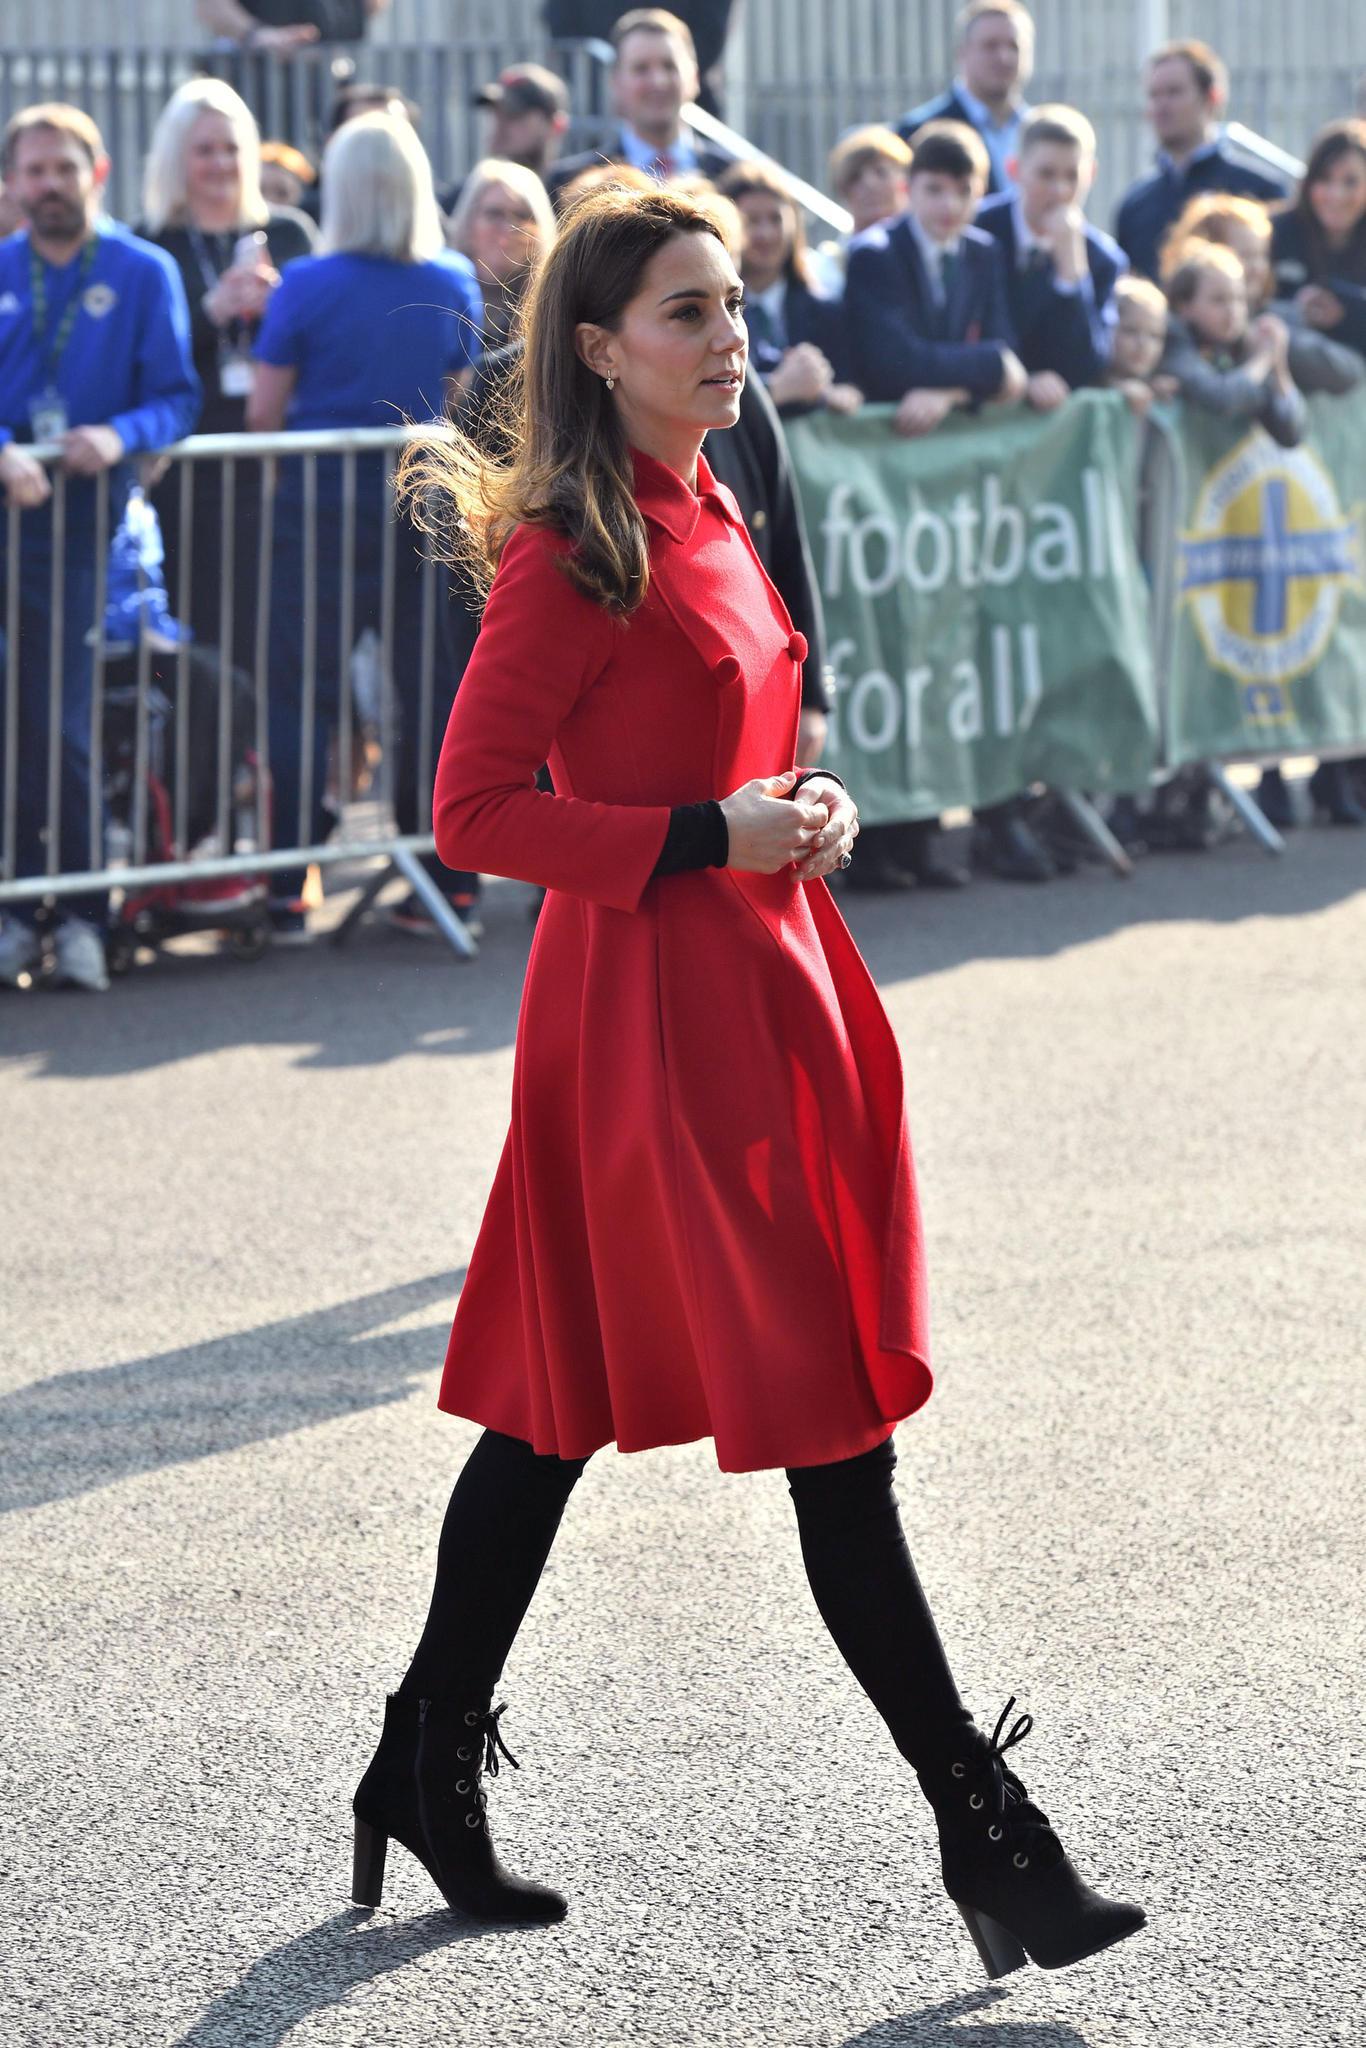 Tagsüber kommt Herzogin Catherine in Knallrot in Belfast an.